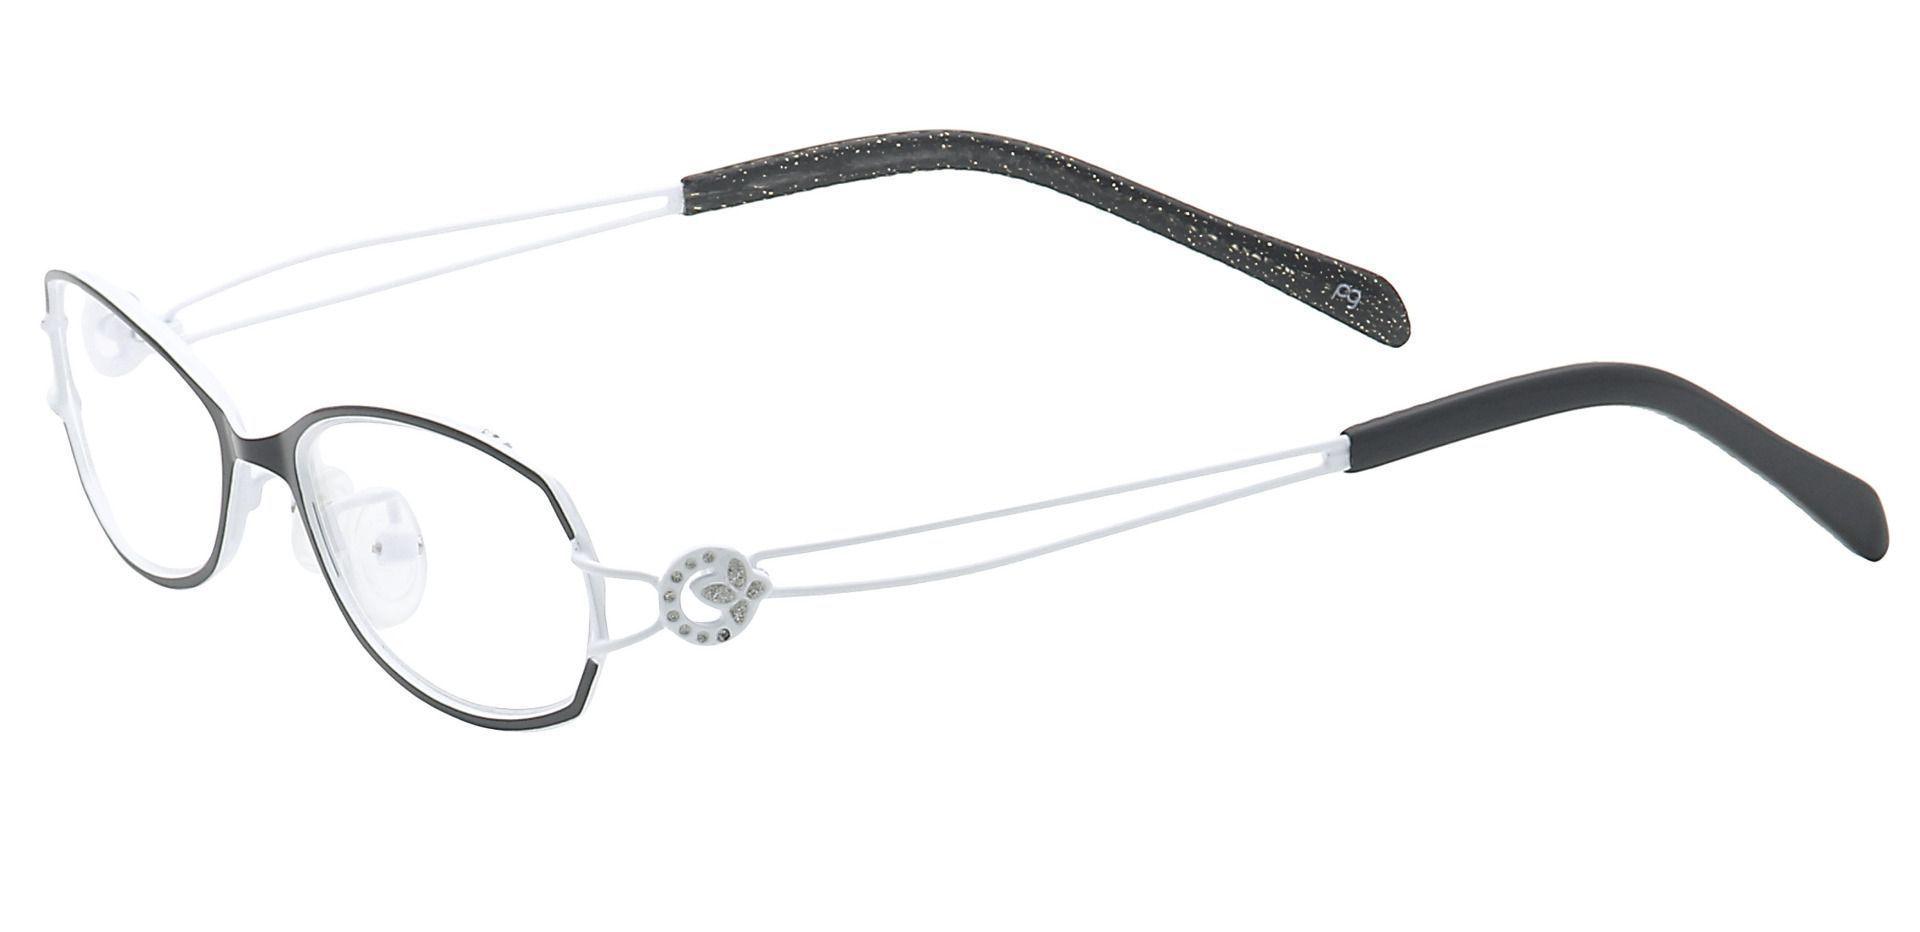 Cece Oval Reading Glasses - Black